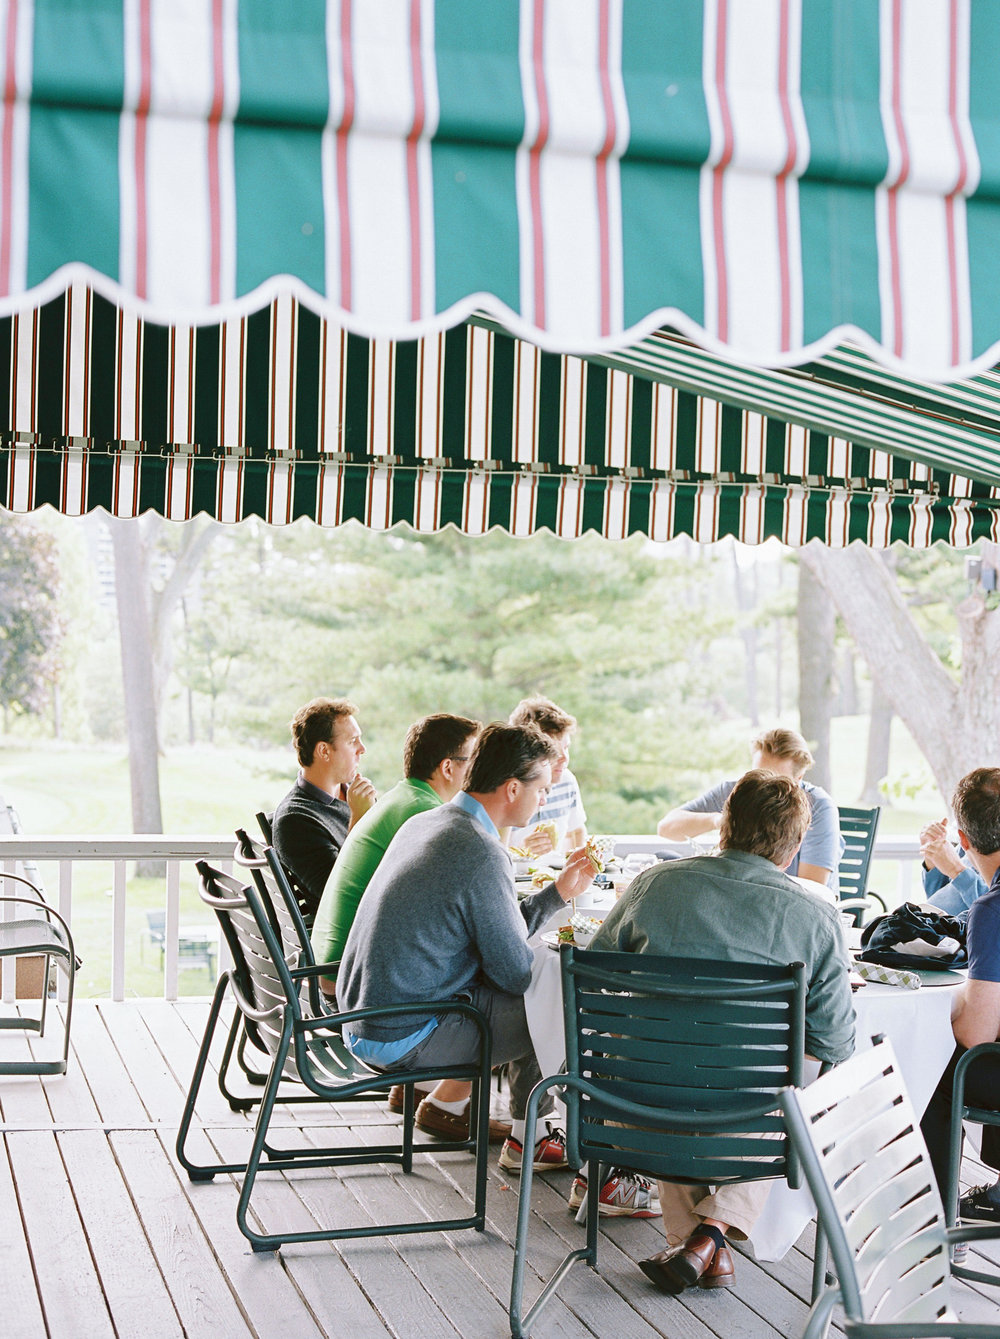 0029-Geneva-Ian-Wedding-Toronto Golf Club-When He Found Her-TorontoPhotographer.jpg